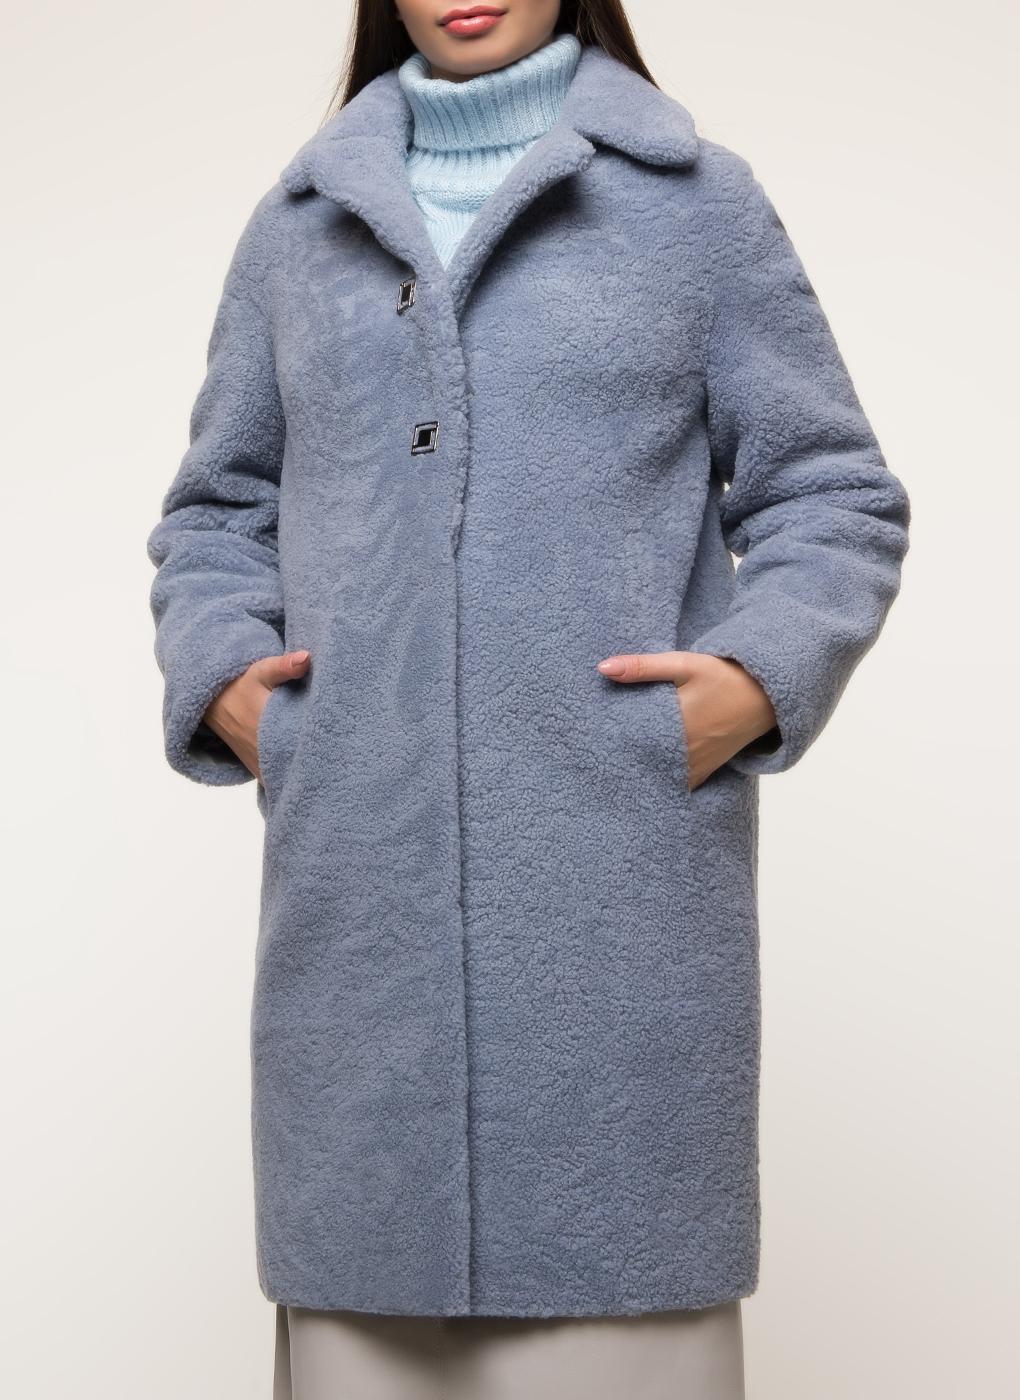 Пальто из овчины 01, Roberto rafio фото